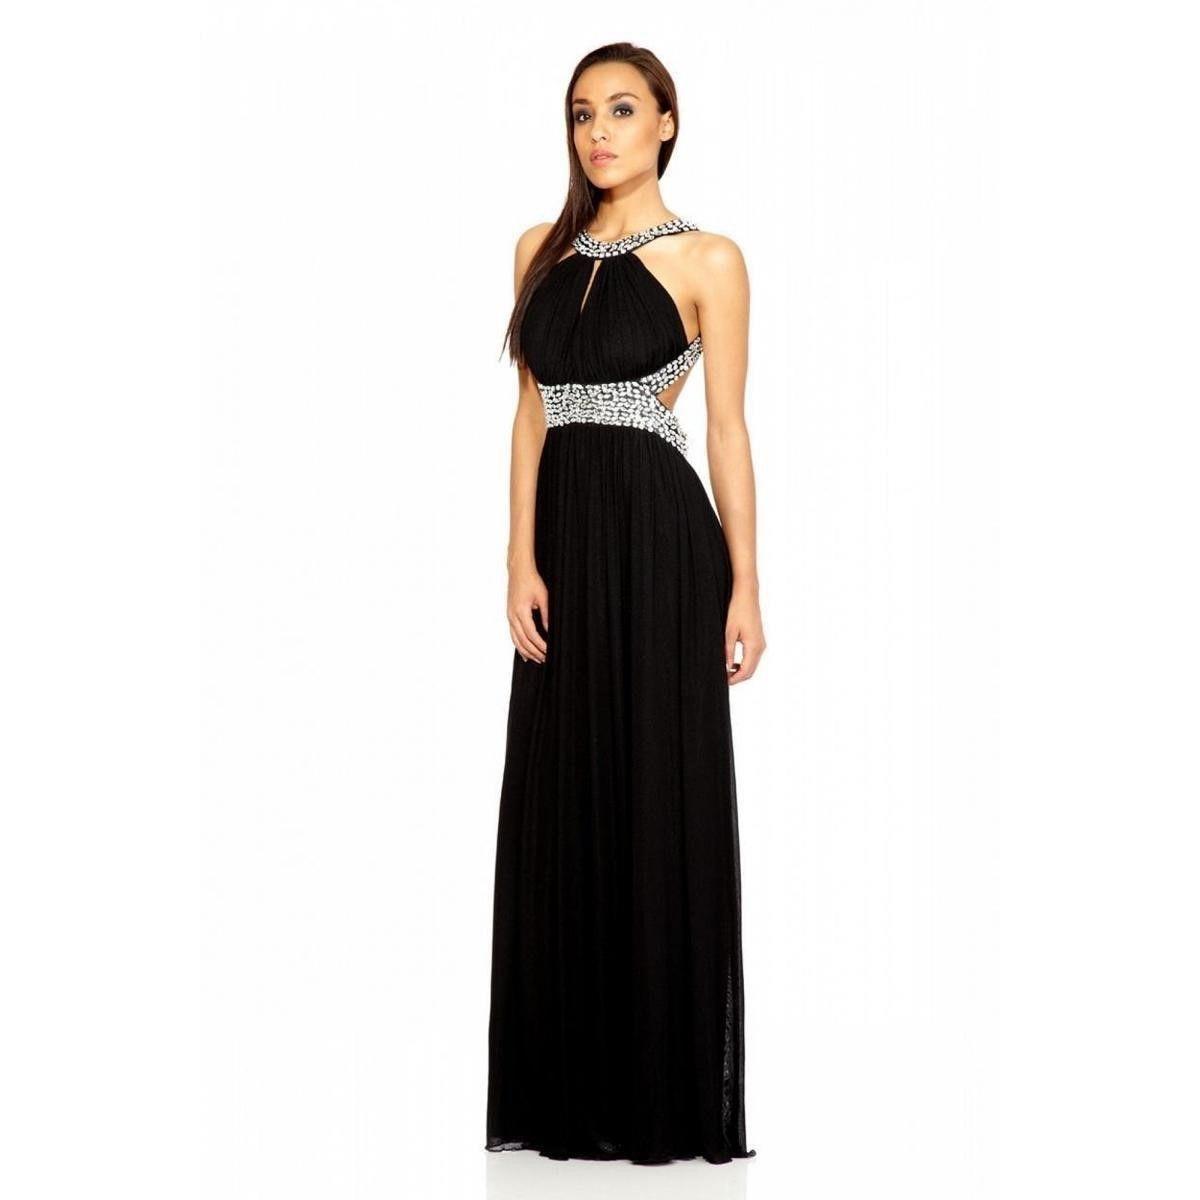 plus size evening dresses debenhams | Best dress ideas | Pinterest ...